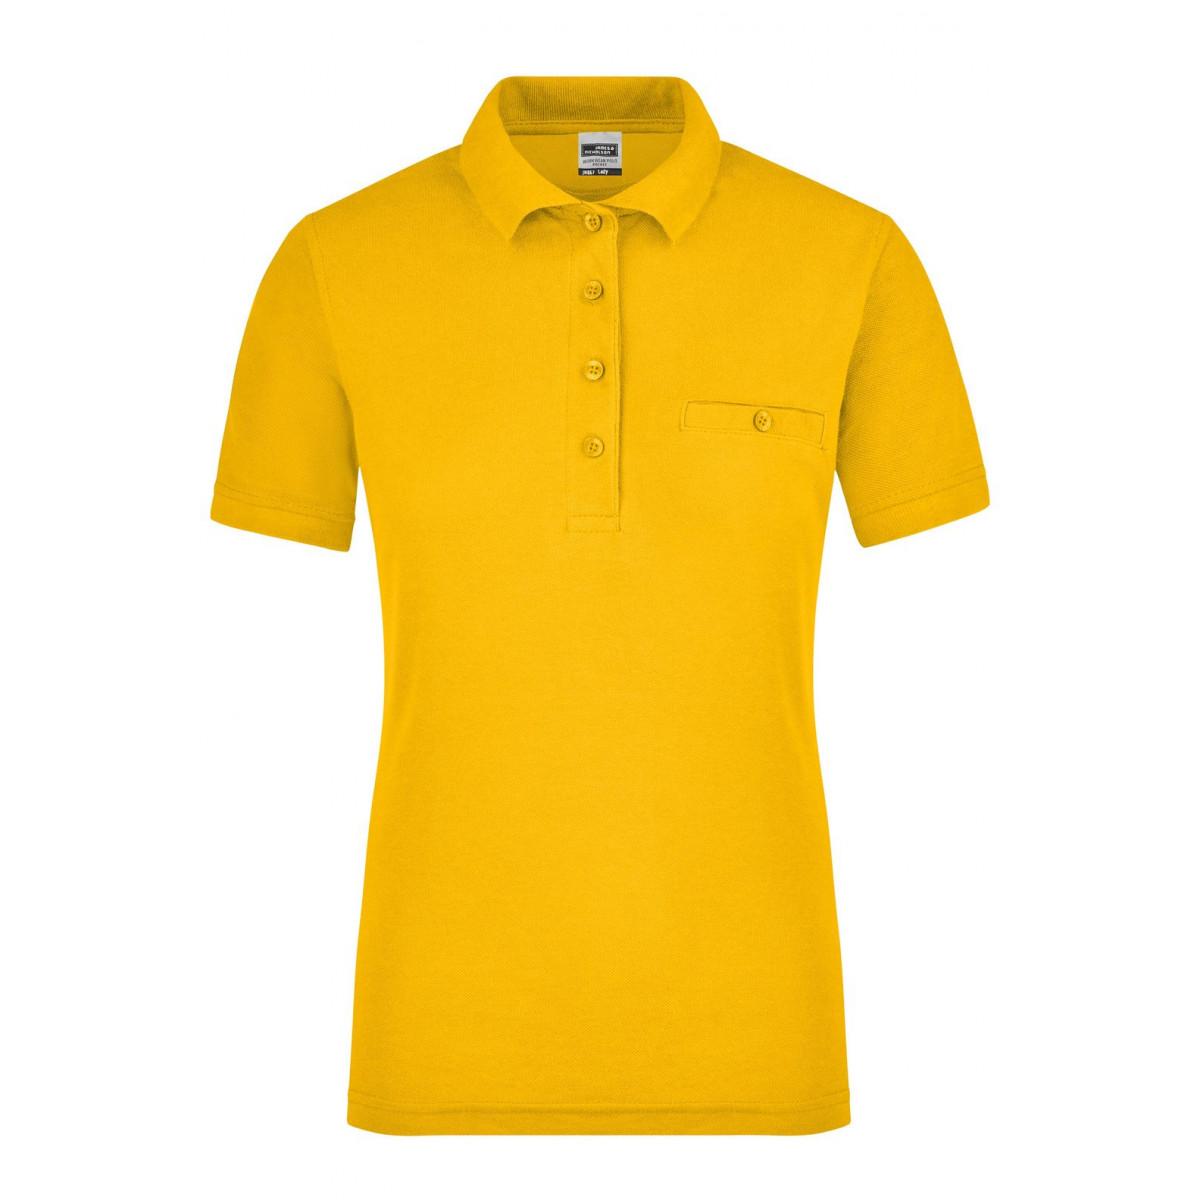 Рубашка поло женская JN867 Ladies Workwear Polo Pocket - Золоистый желтый